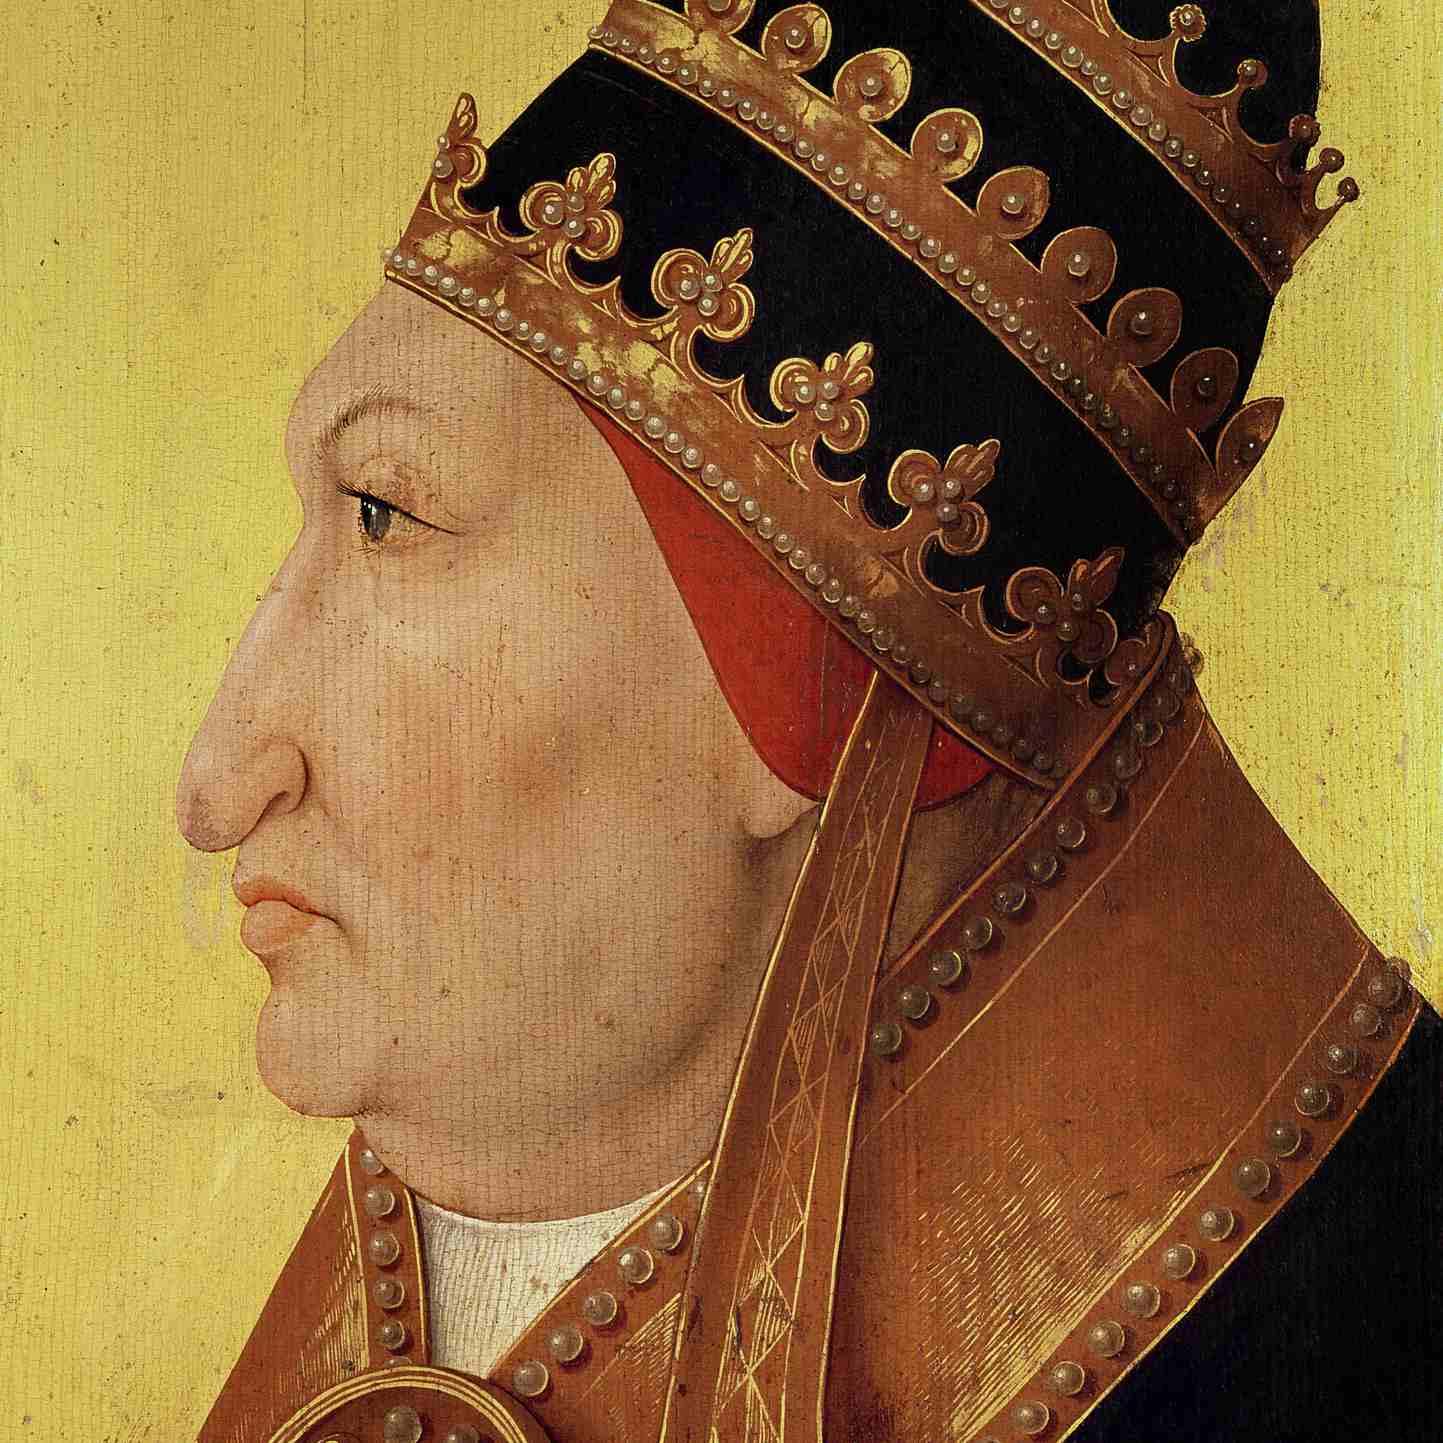 Painting of Portrait of Rodrigo Borgia (1431-1503) Pope Alexander VI